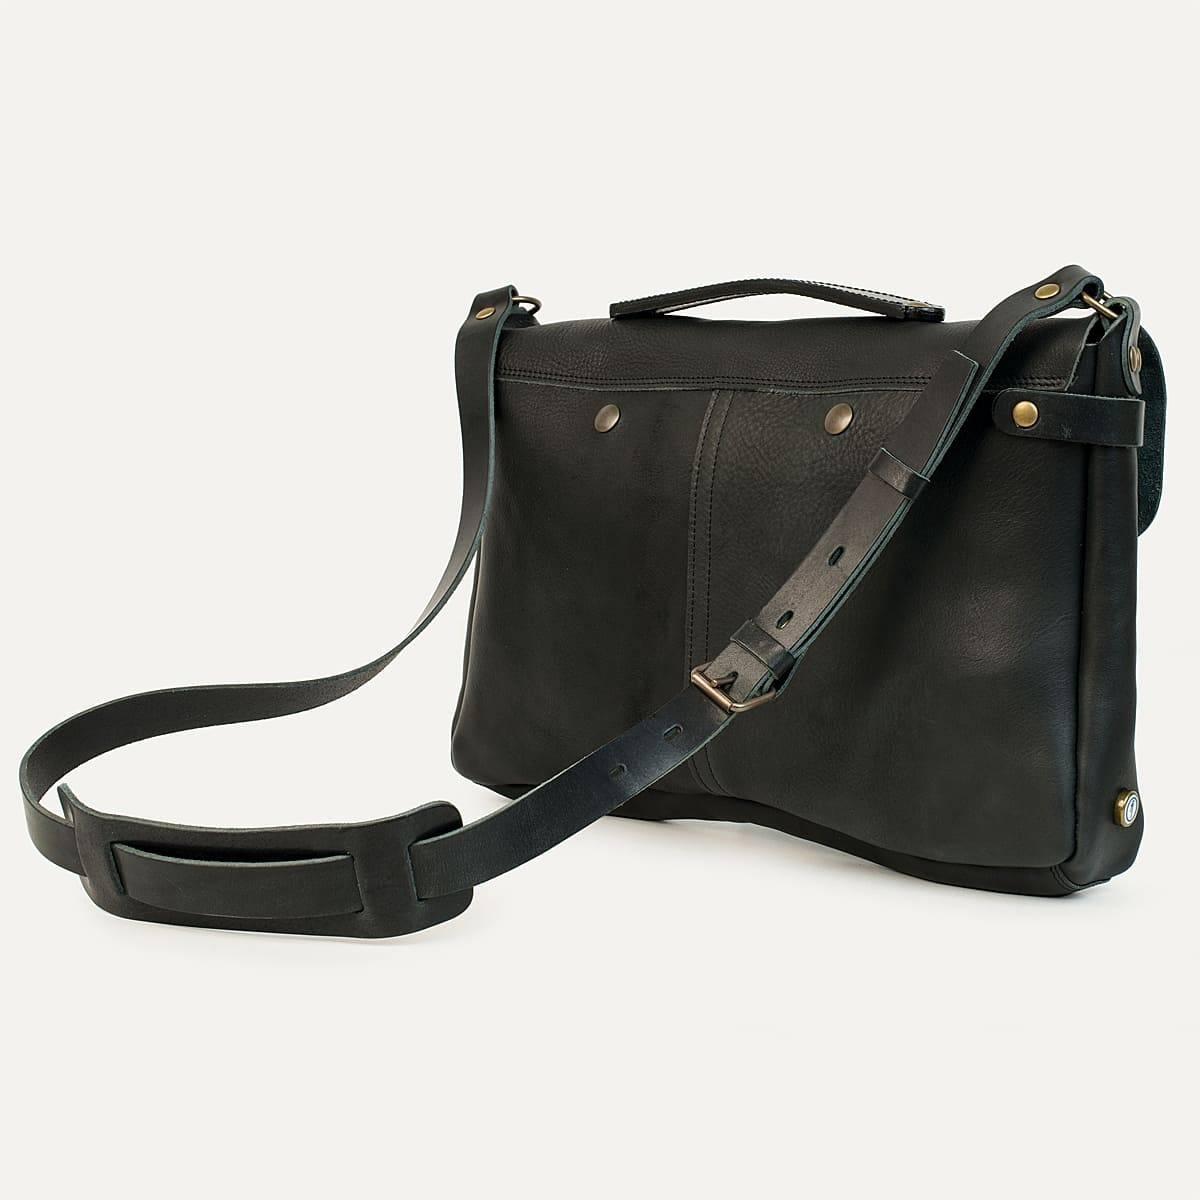 Justin plumber bag - Black (image n°4)